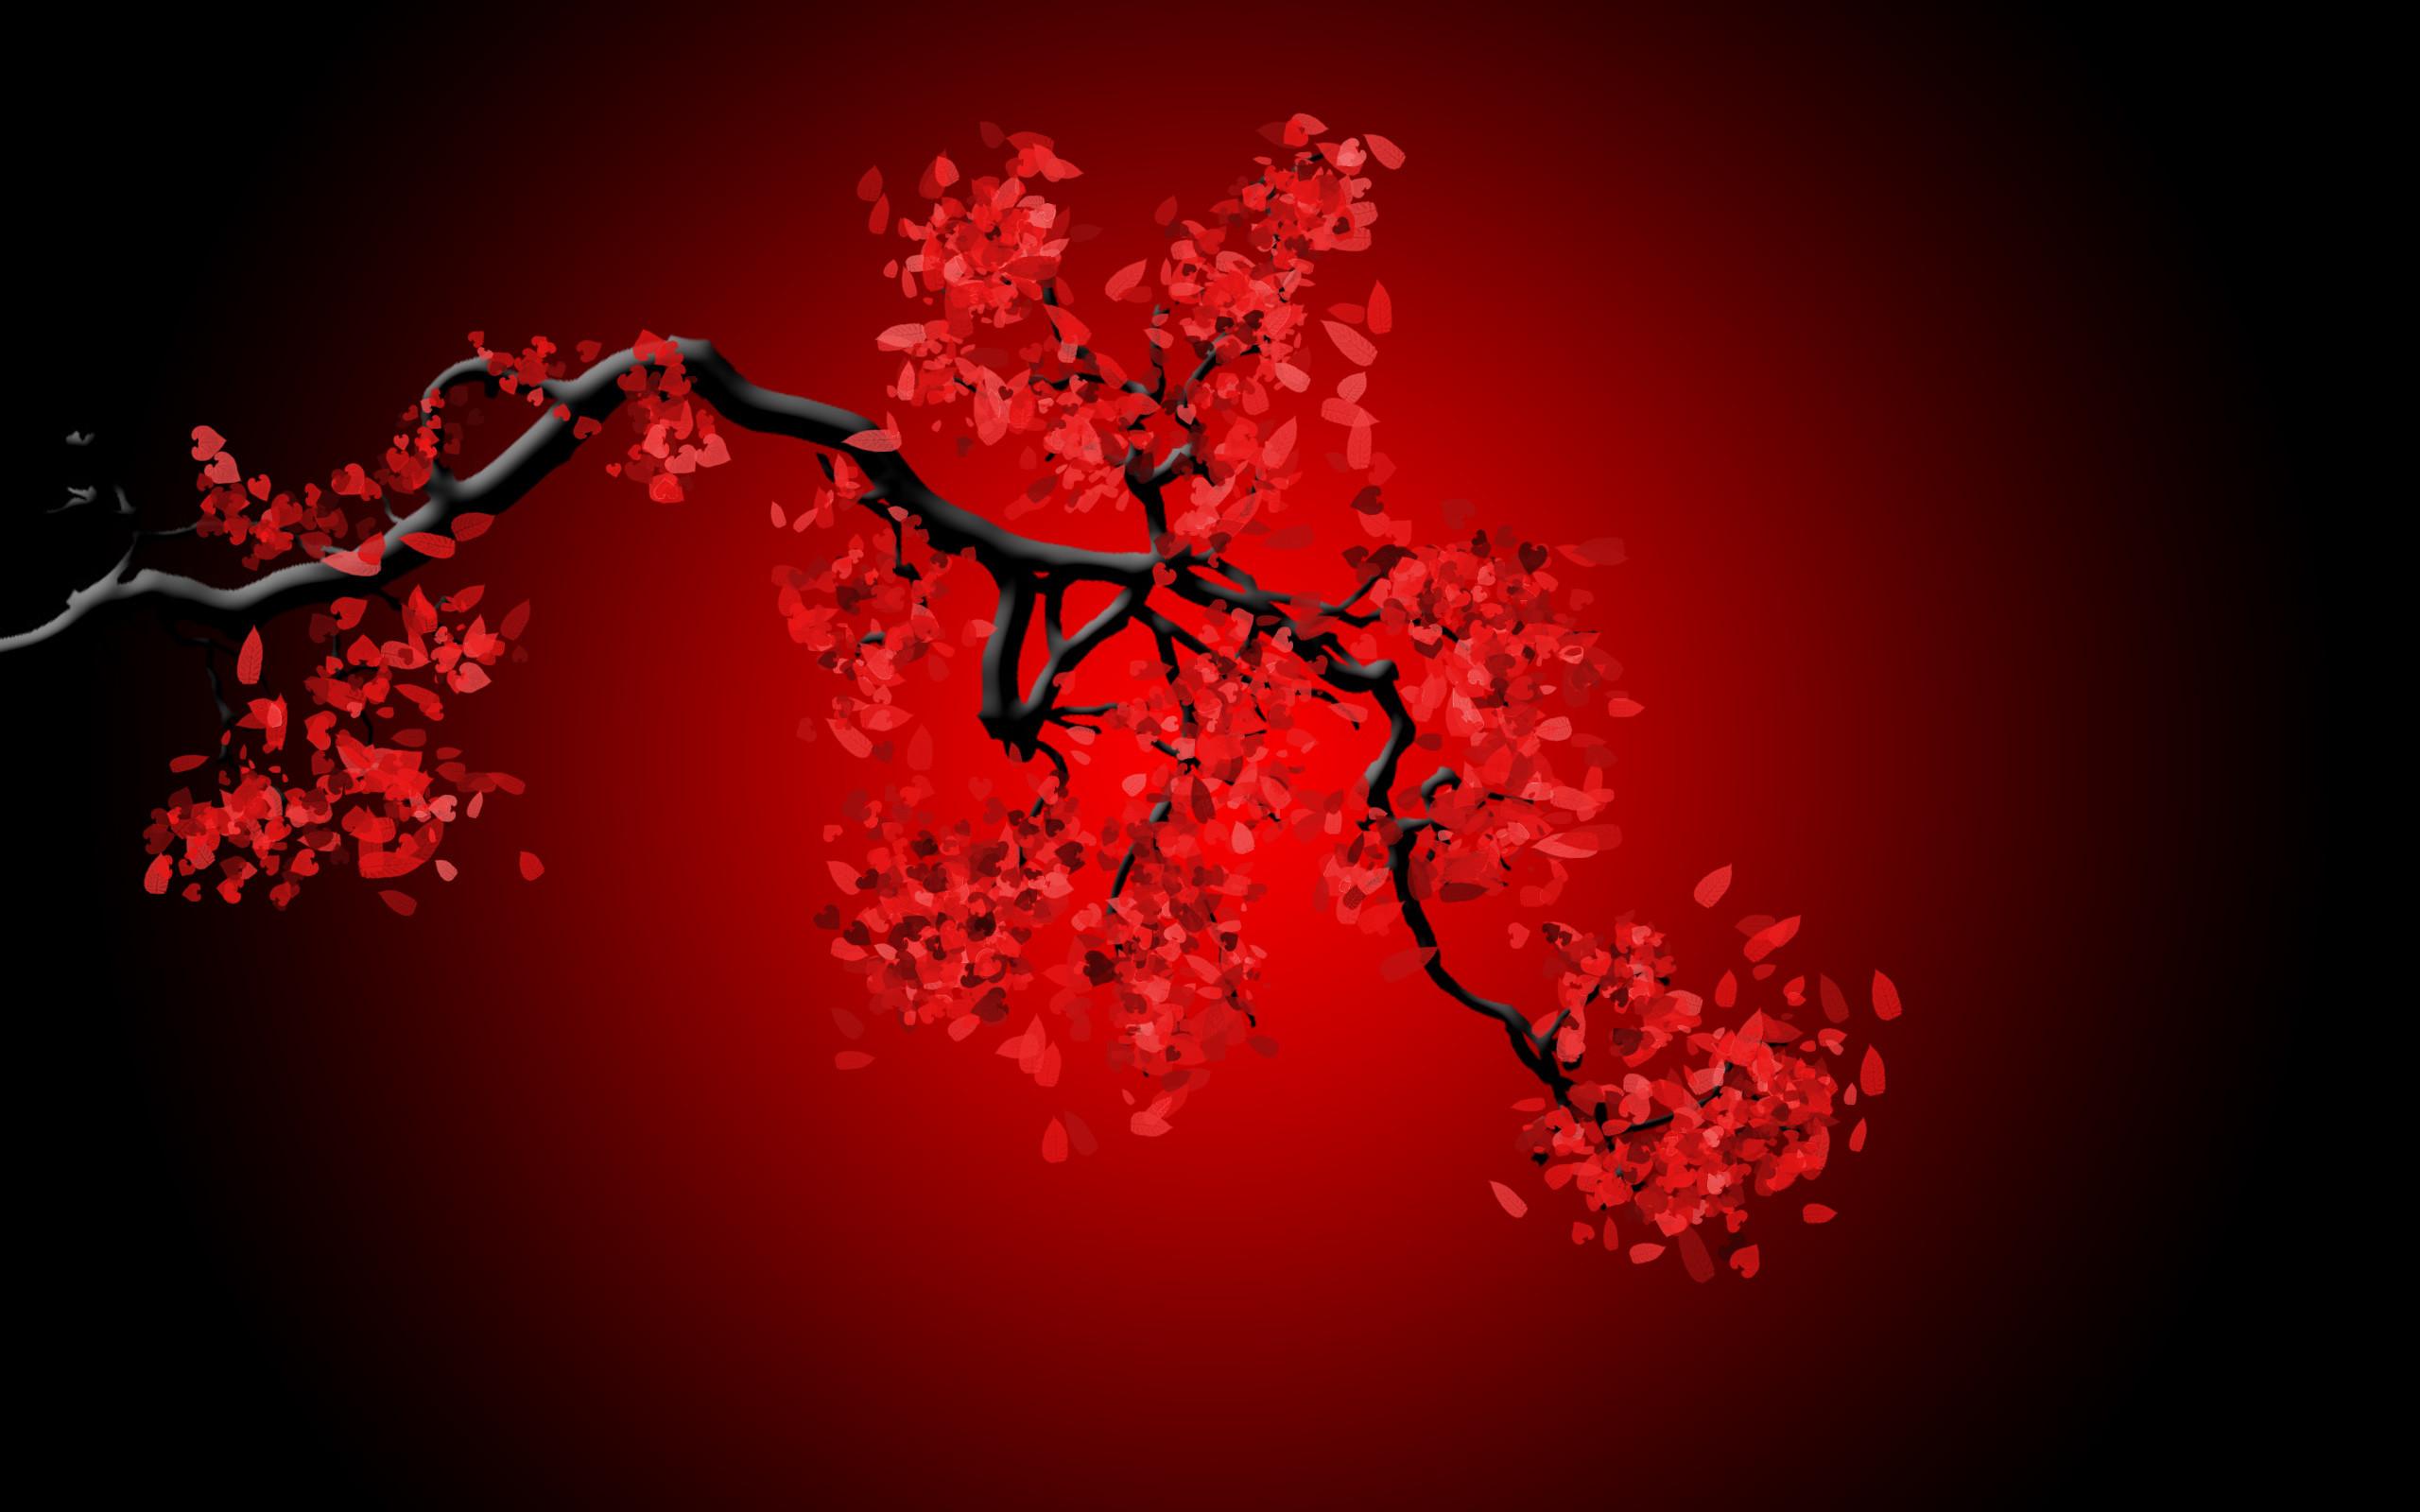 Black and Red Wallpaper HD ·① WallpaperTag